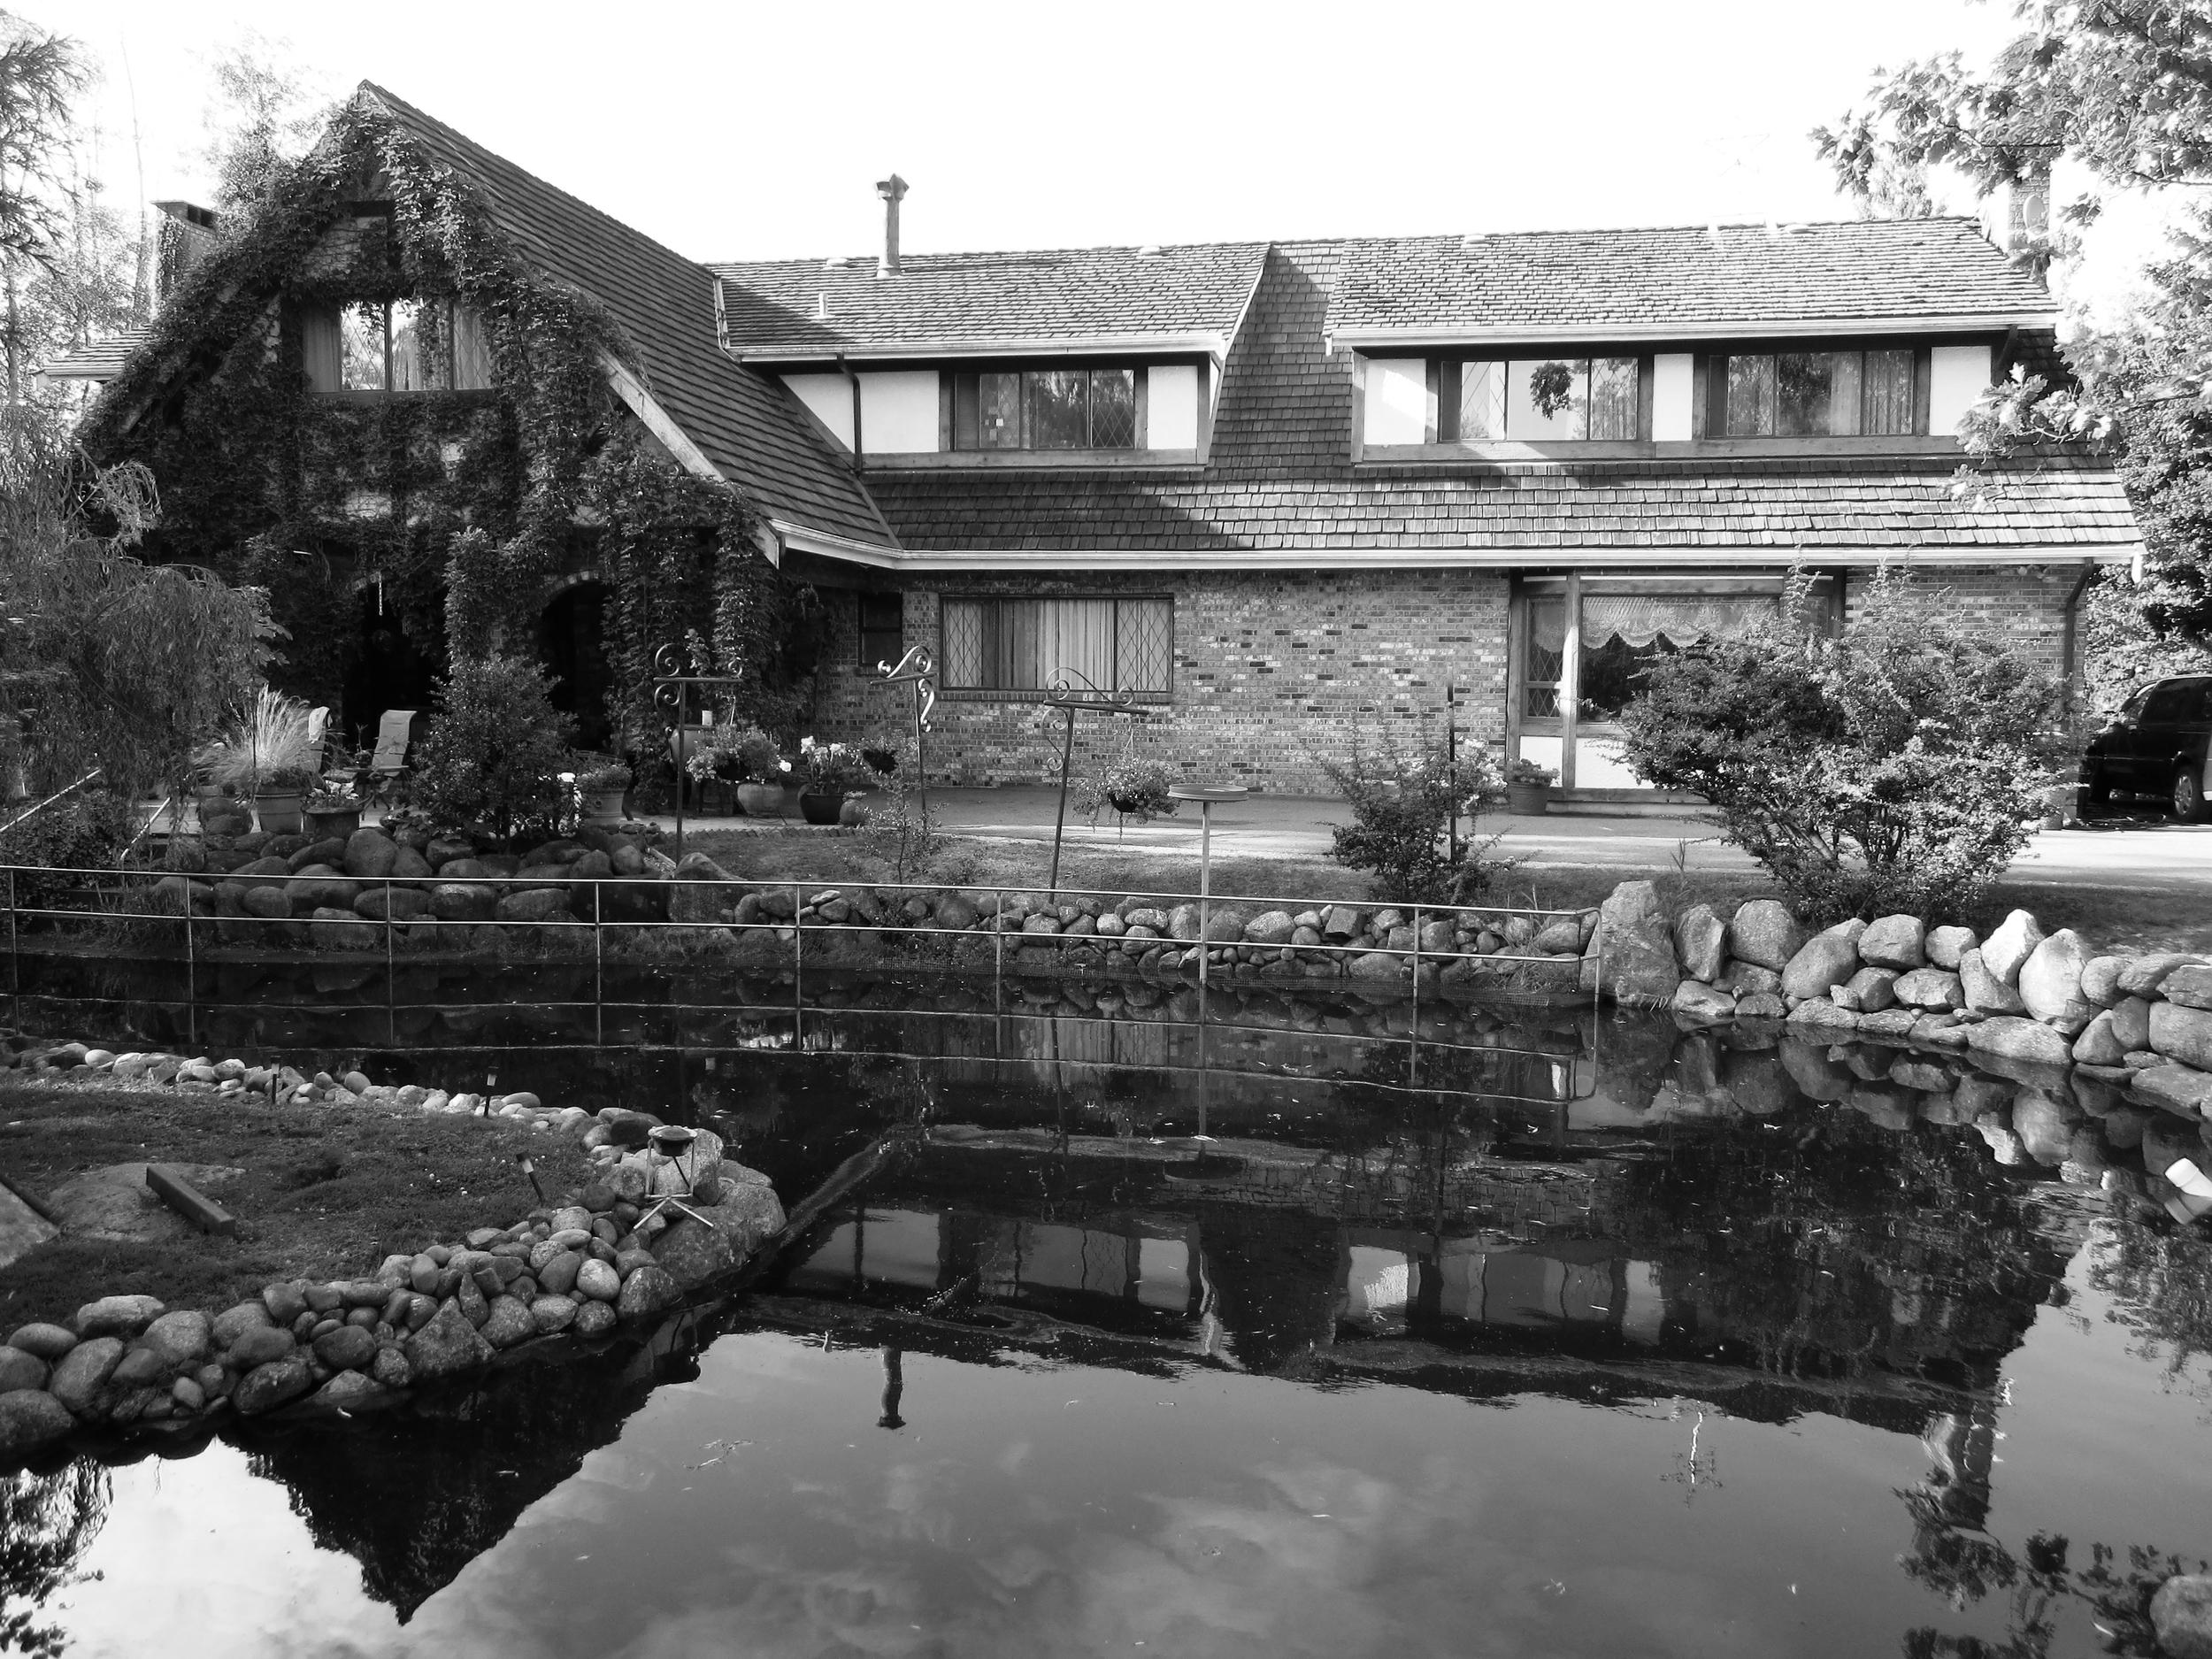 Steunenberg residence